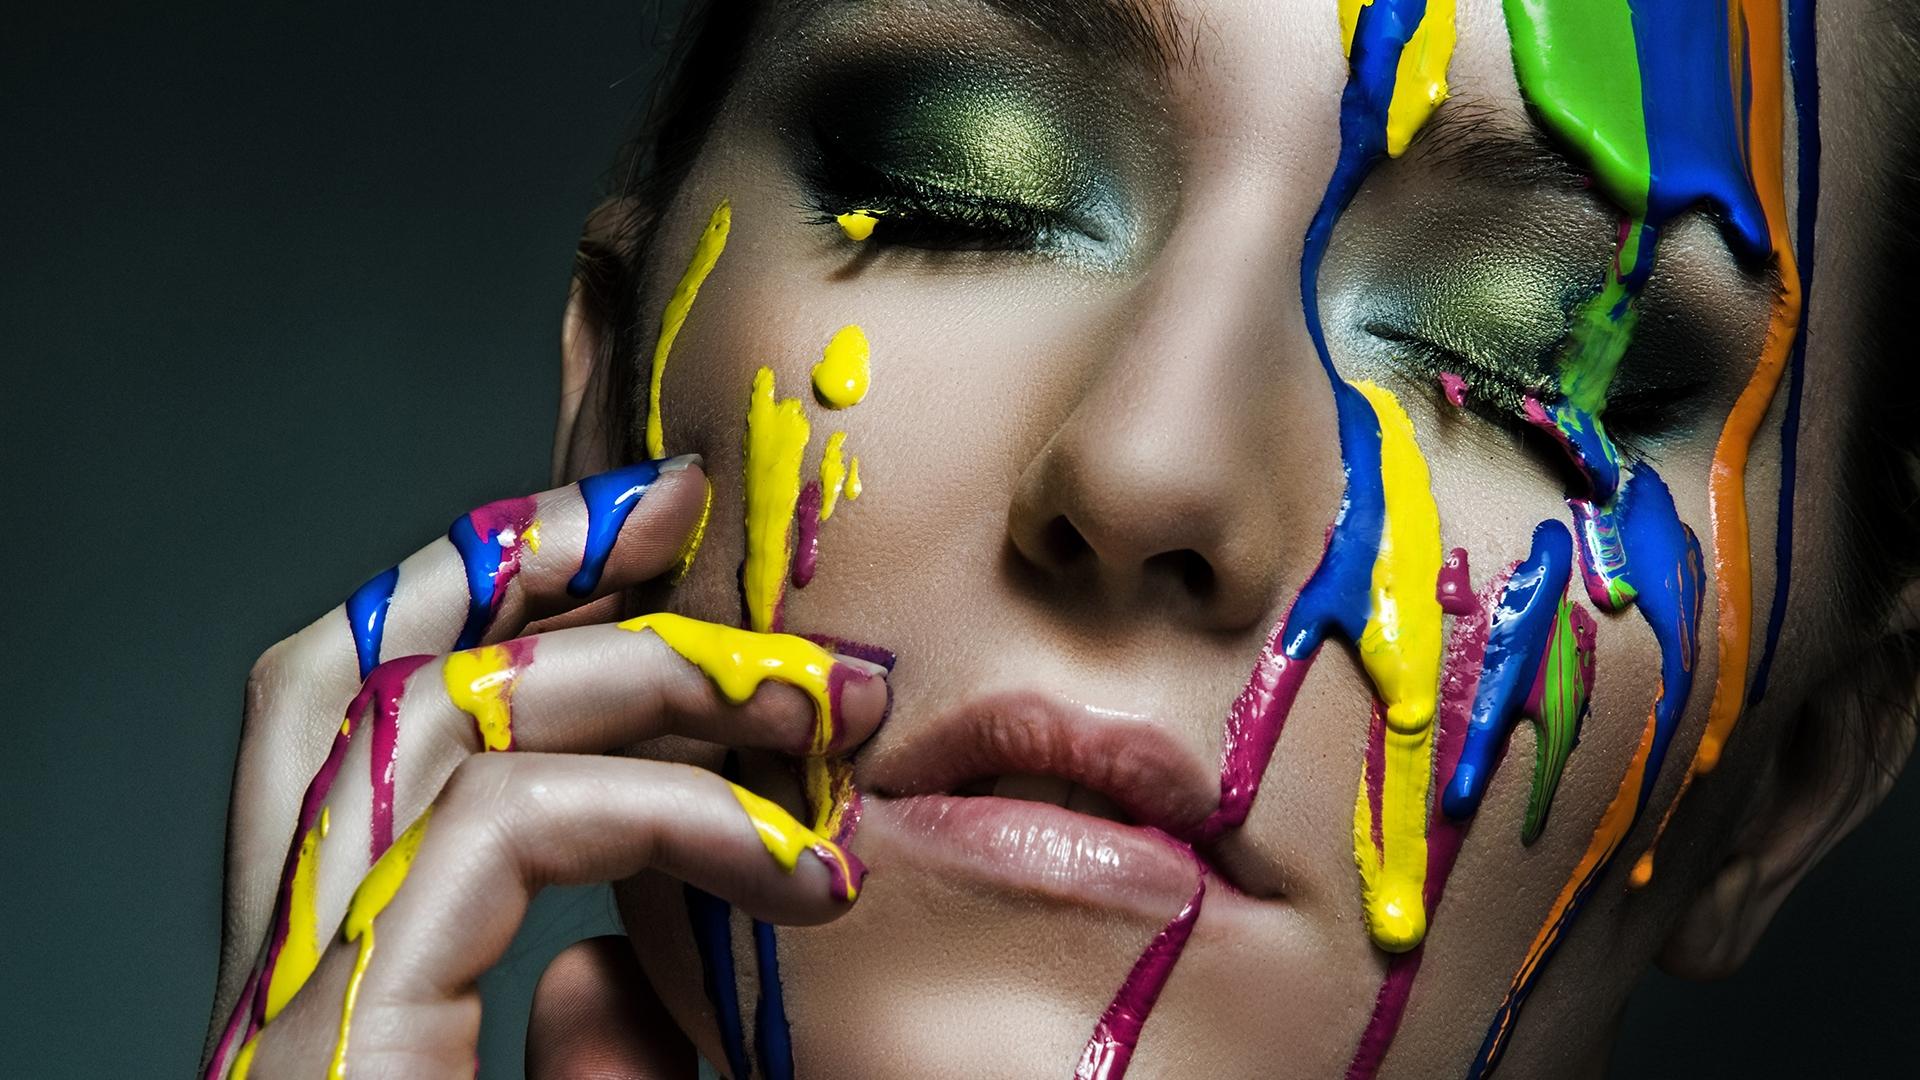 Wallpaper Girl Face Color Colorful Creative 1920x1080